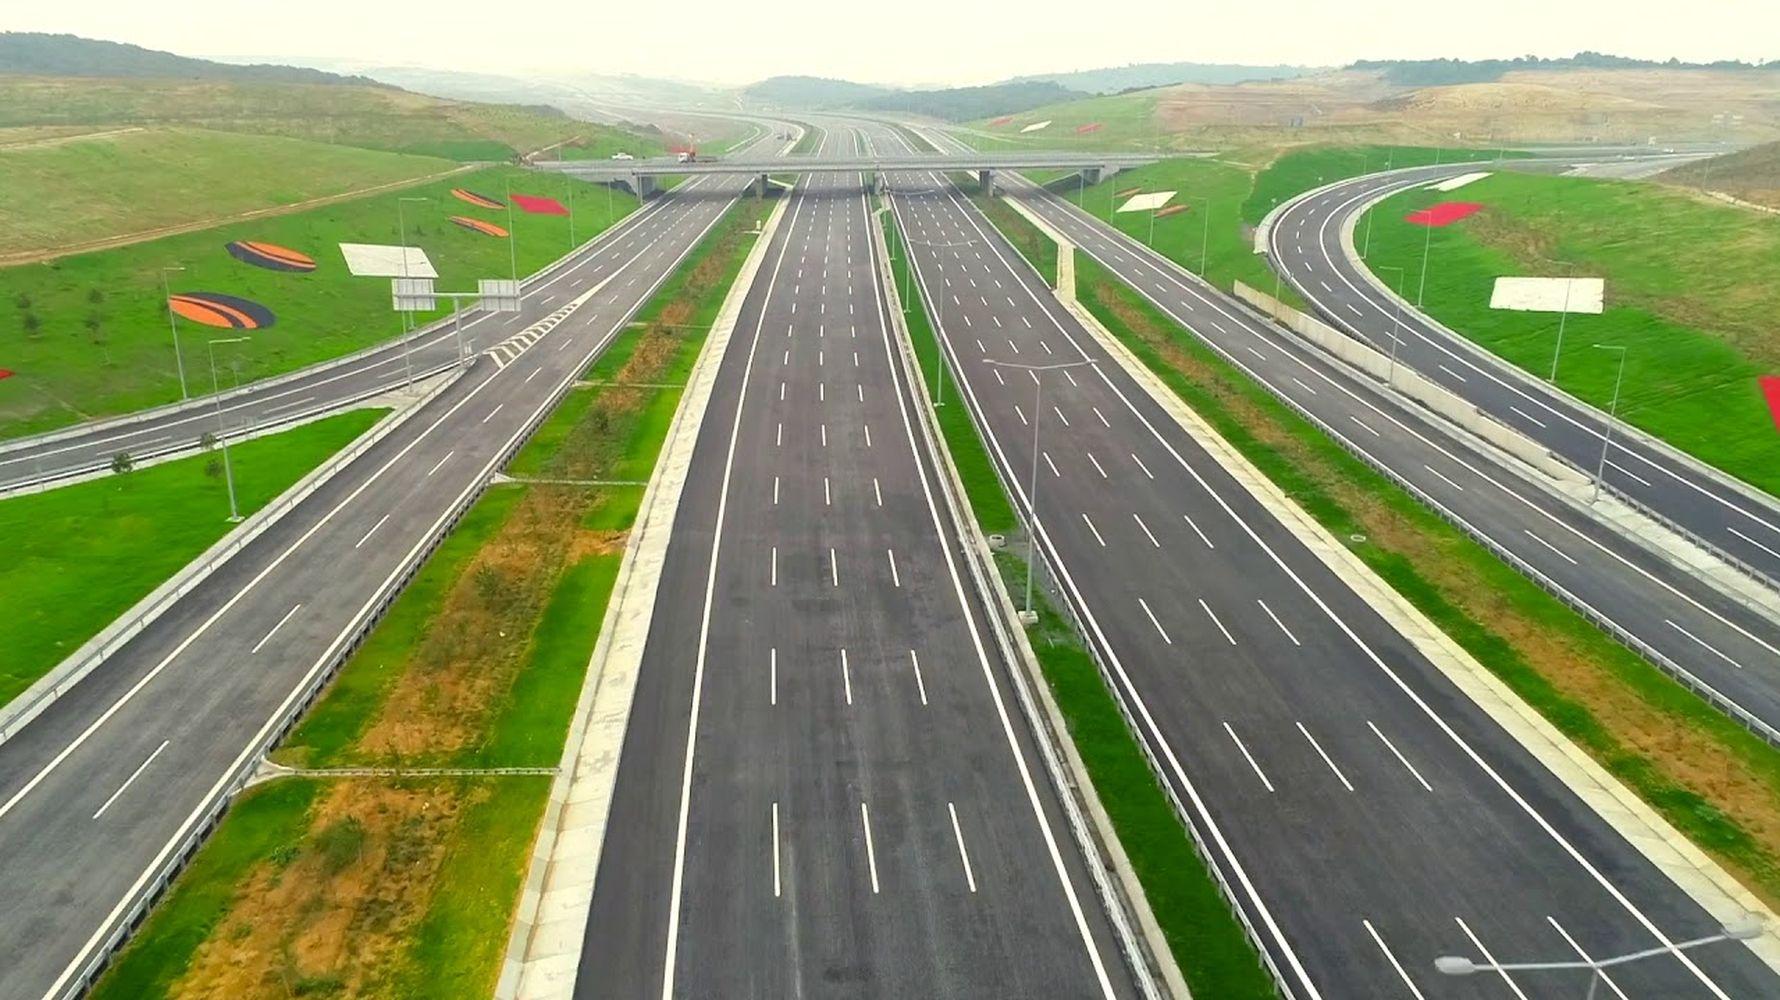 Warranty increased in northern marmara highway tender, time was extended